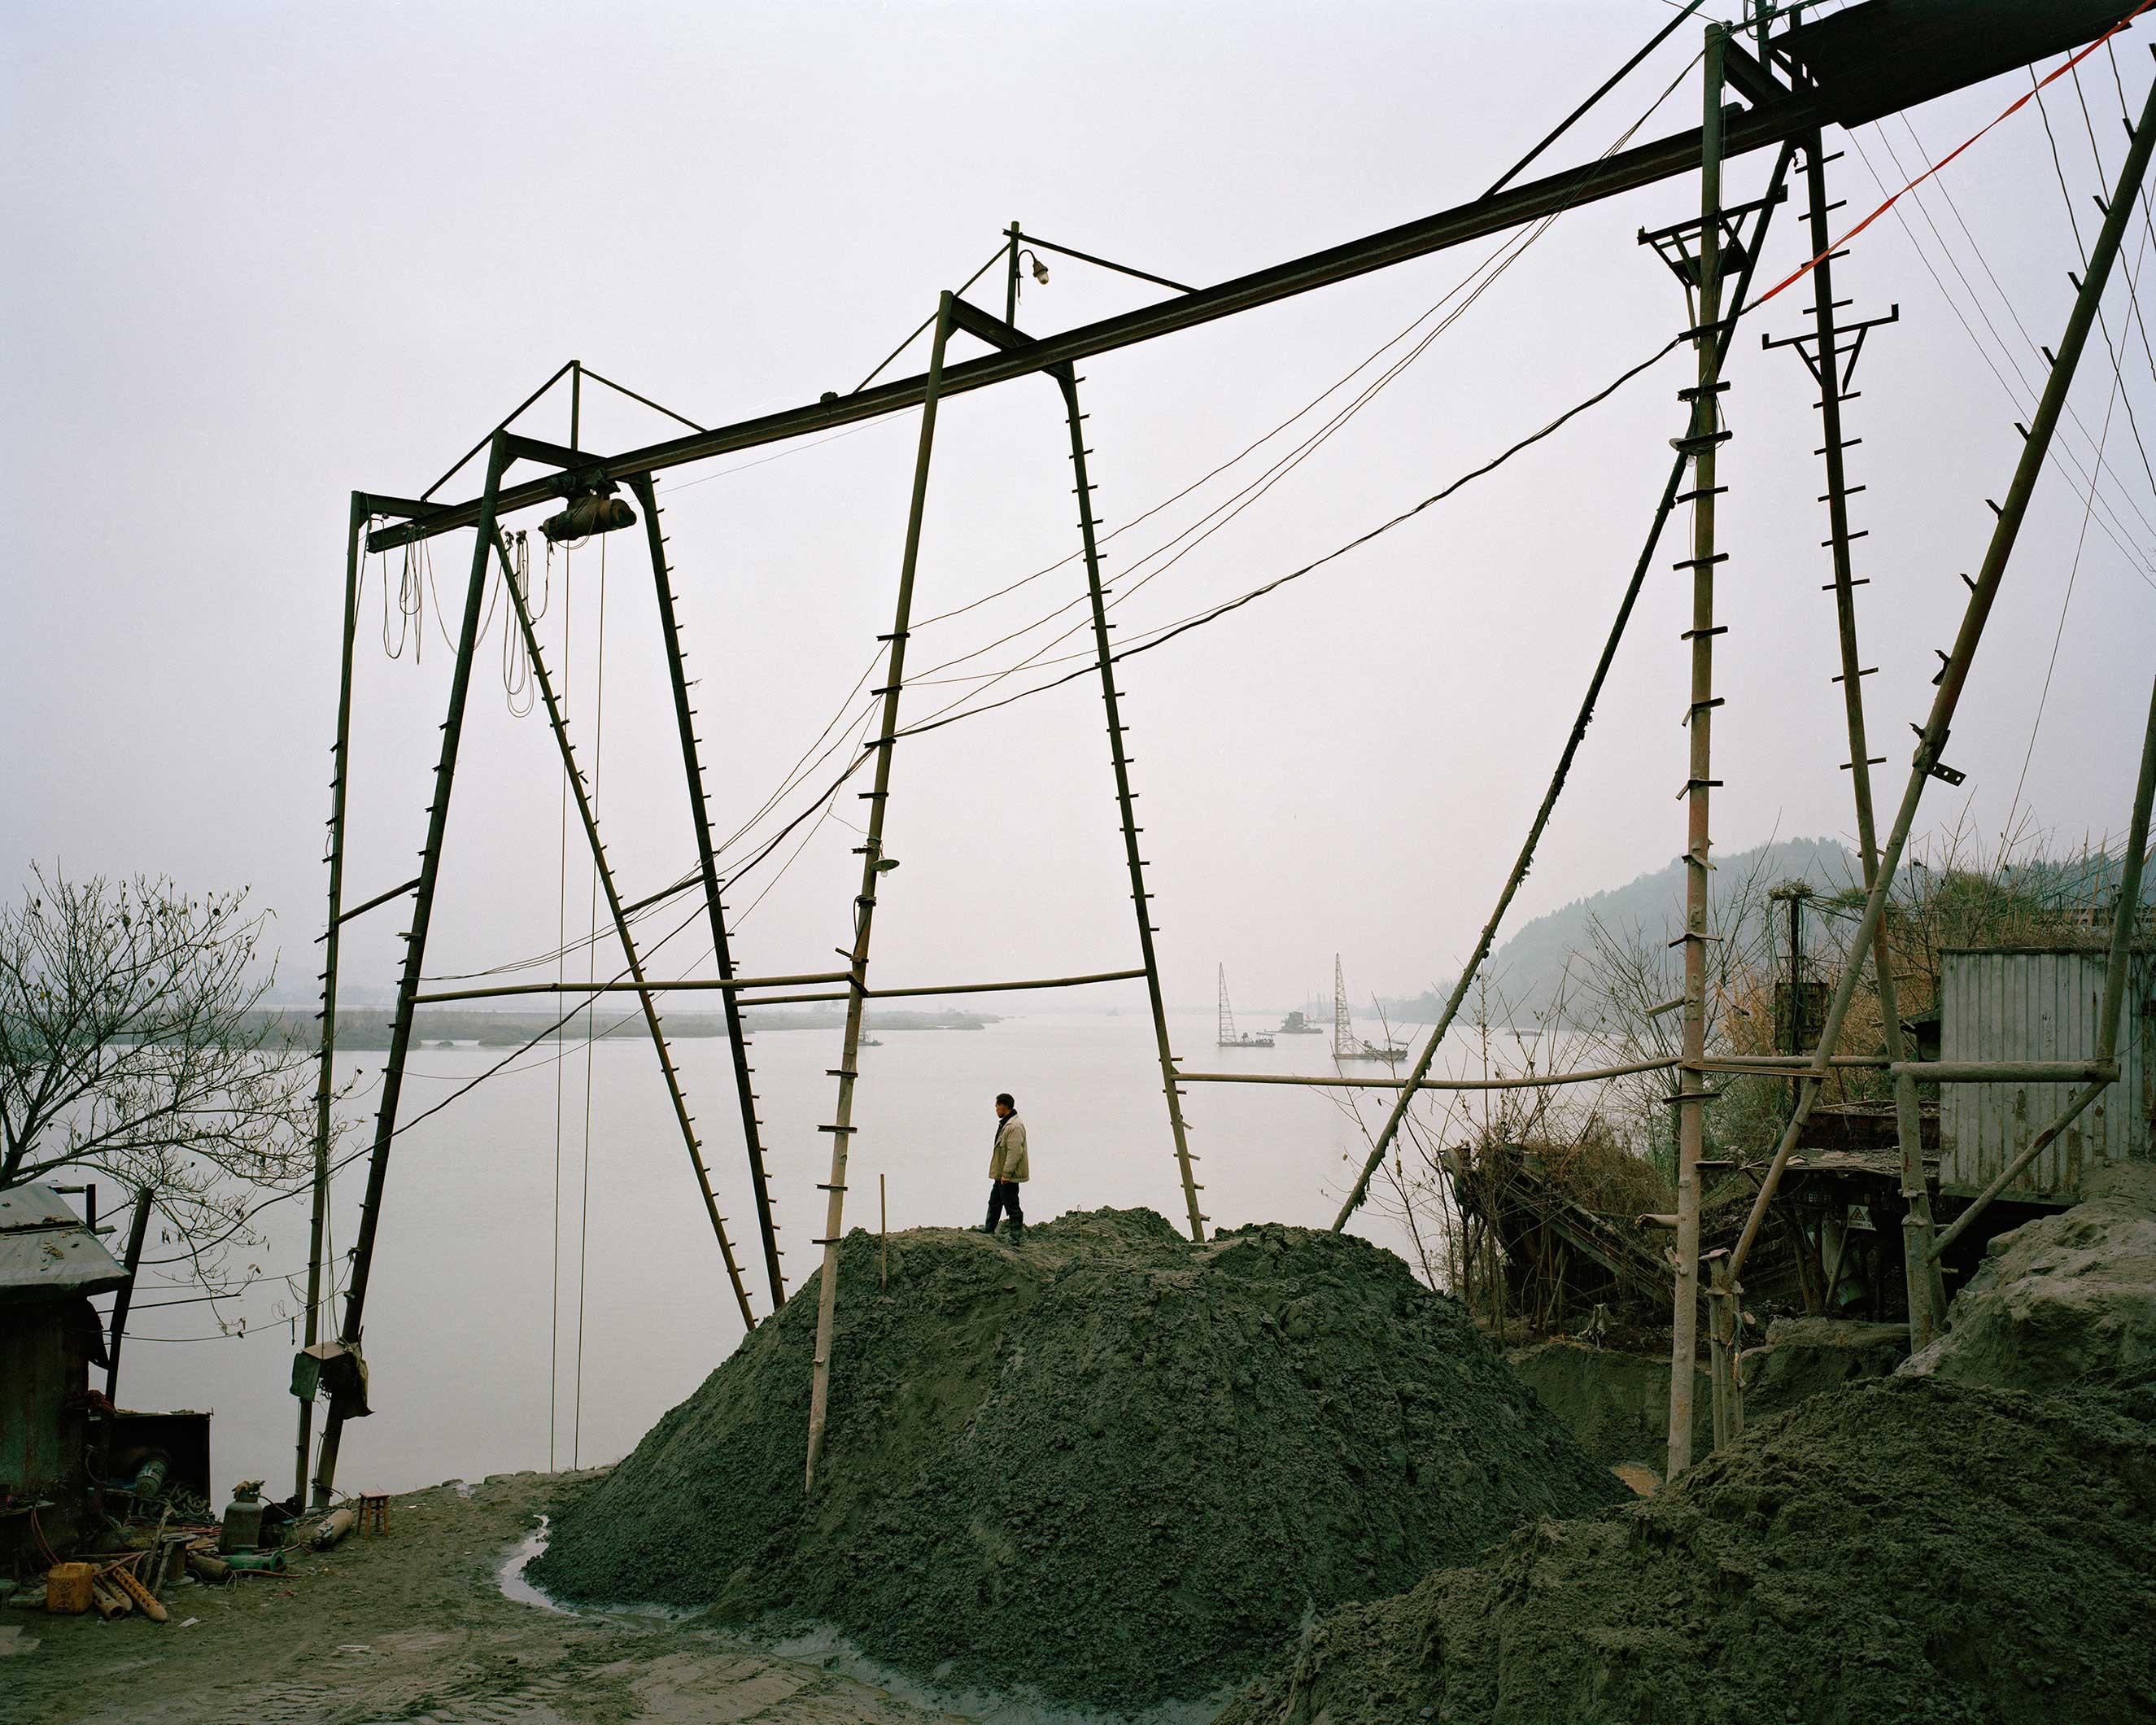 Suining, China, January 2015. Fujian river.